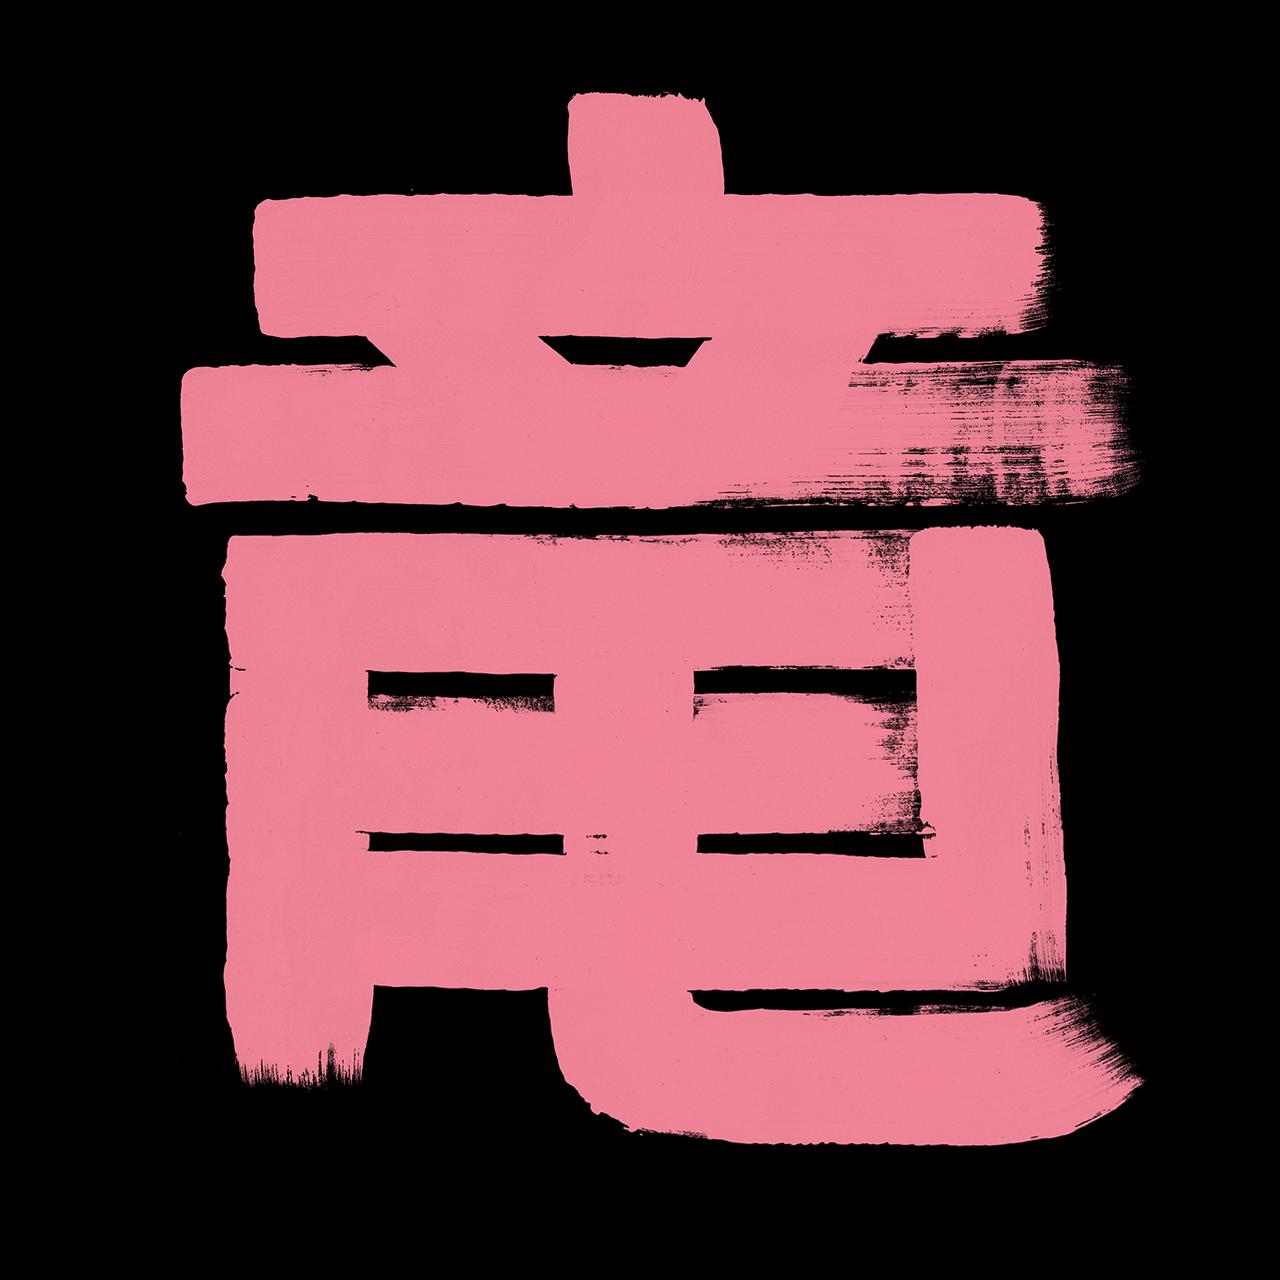 Katakana_PaintedKanji-12.png